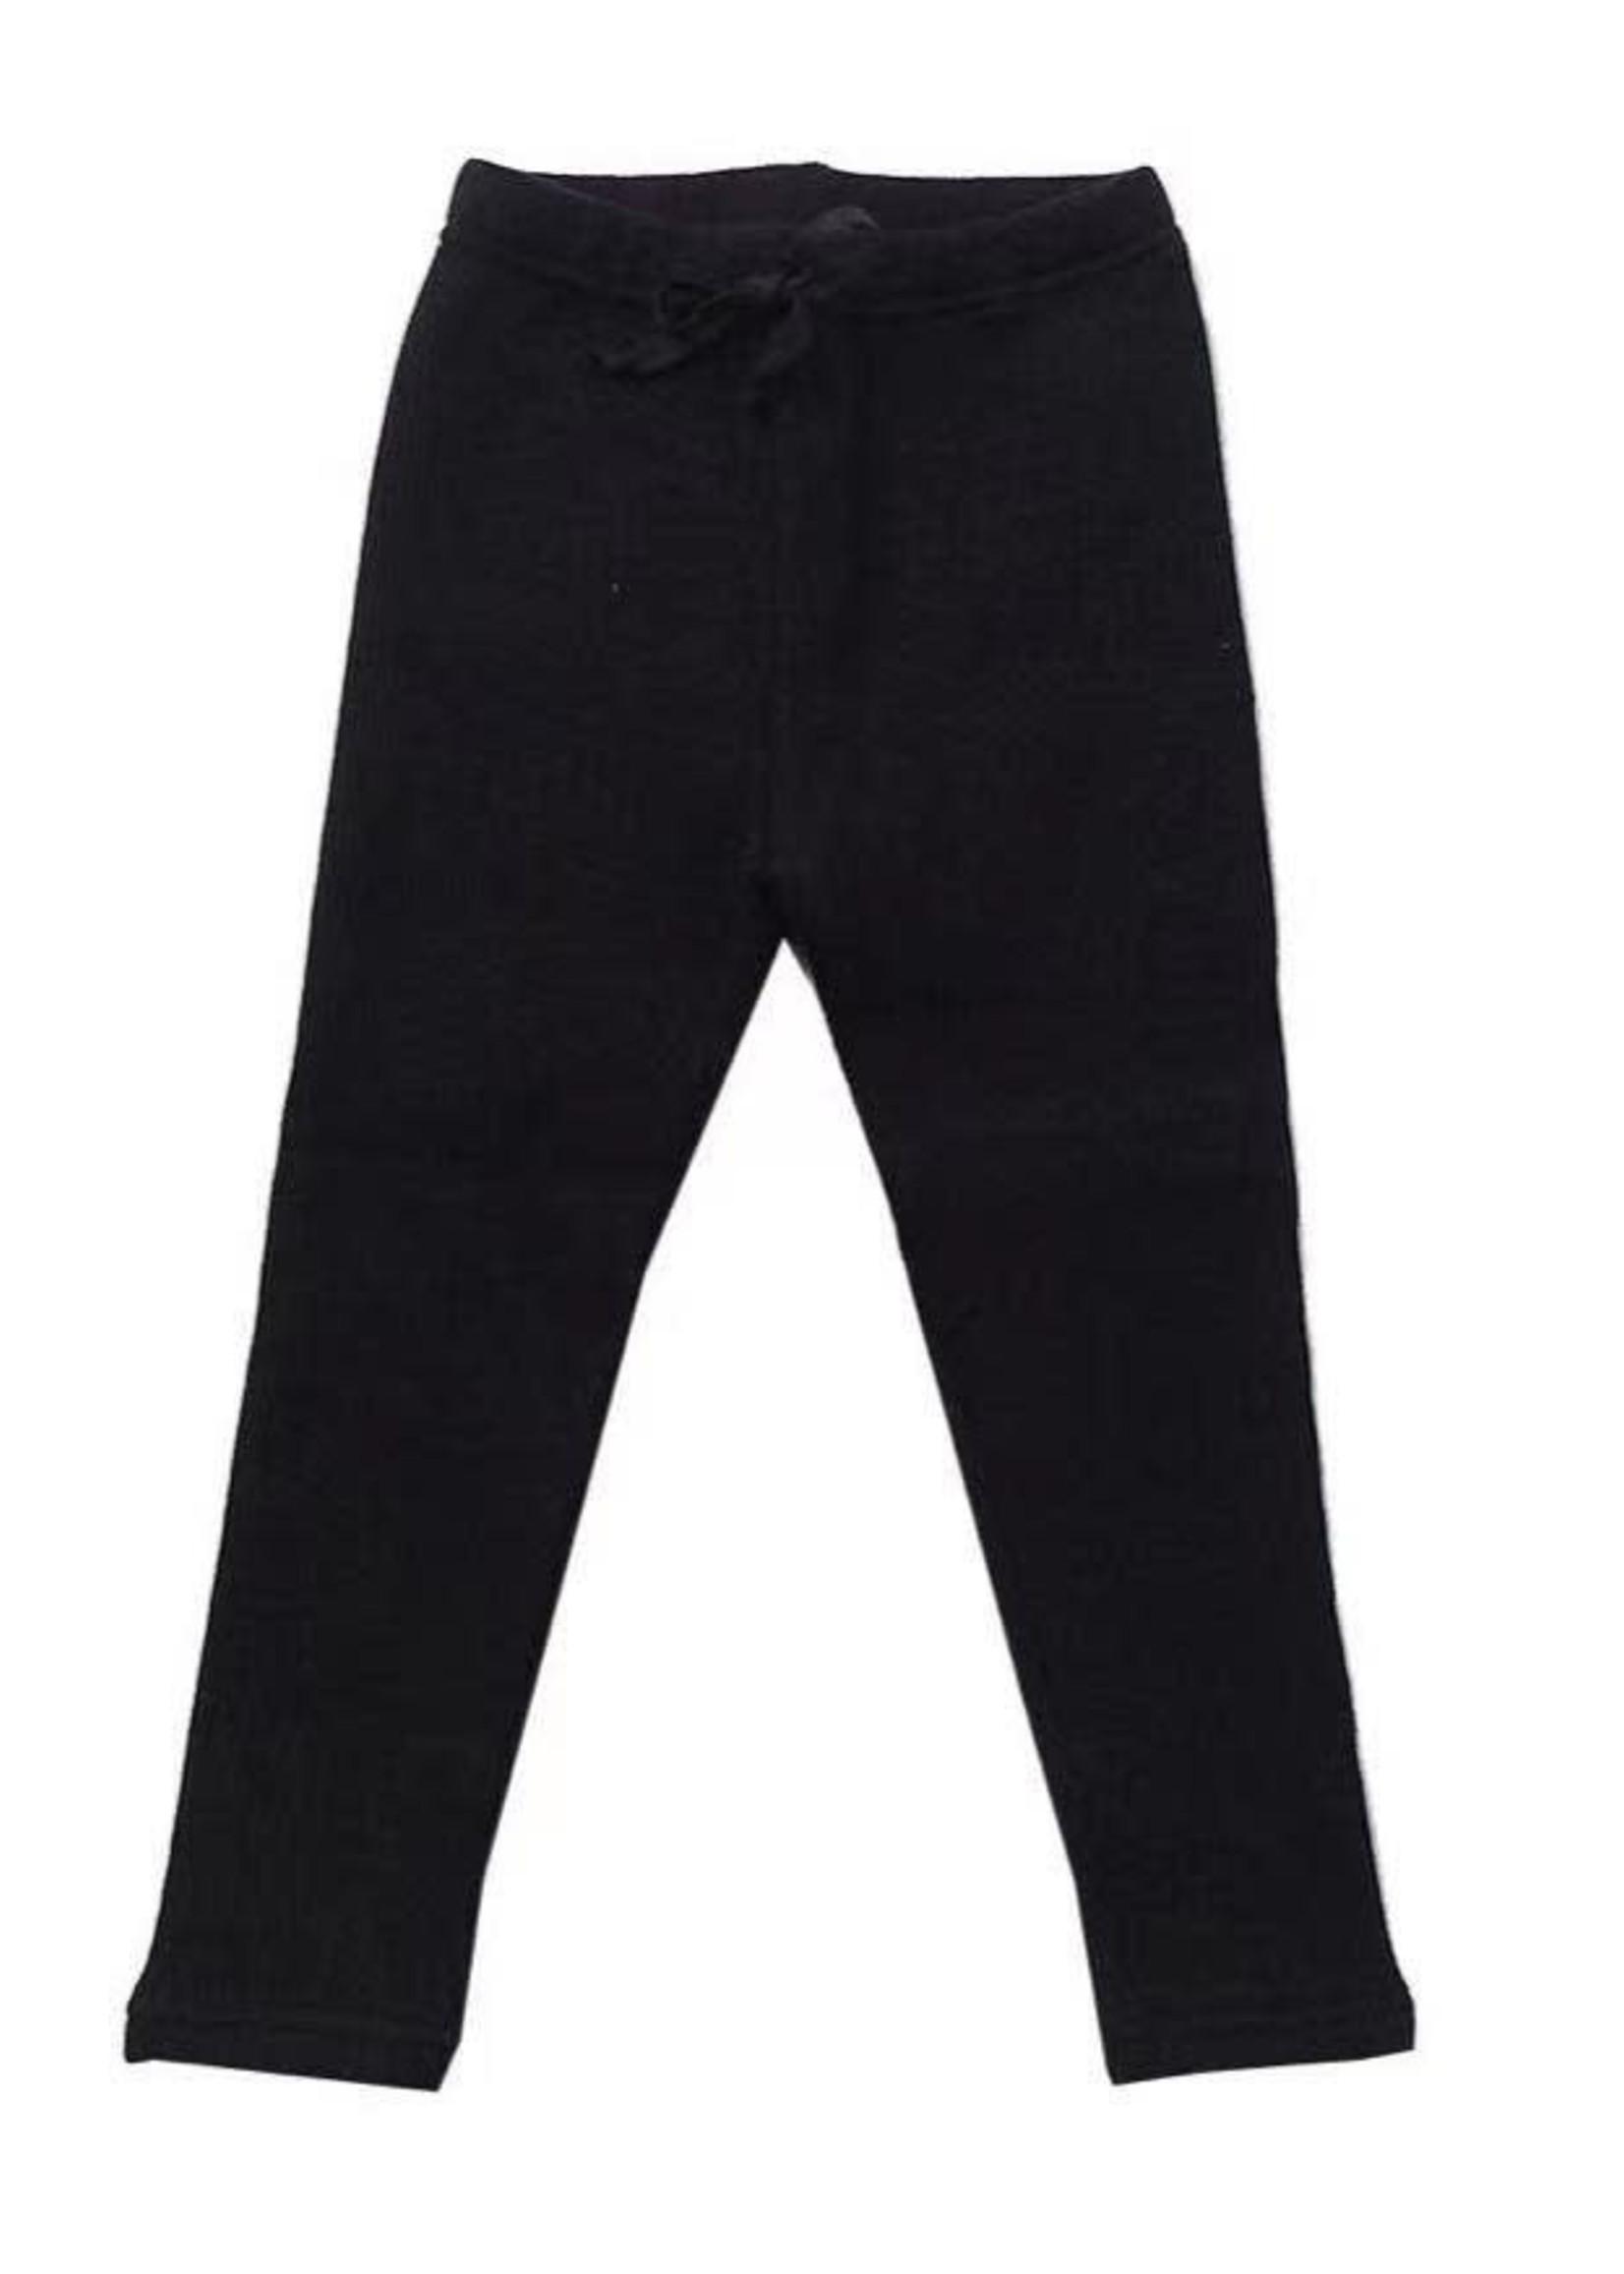 PH Knit Pants (Black)